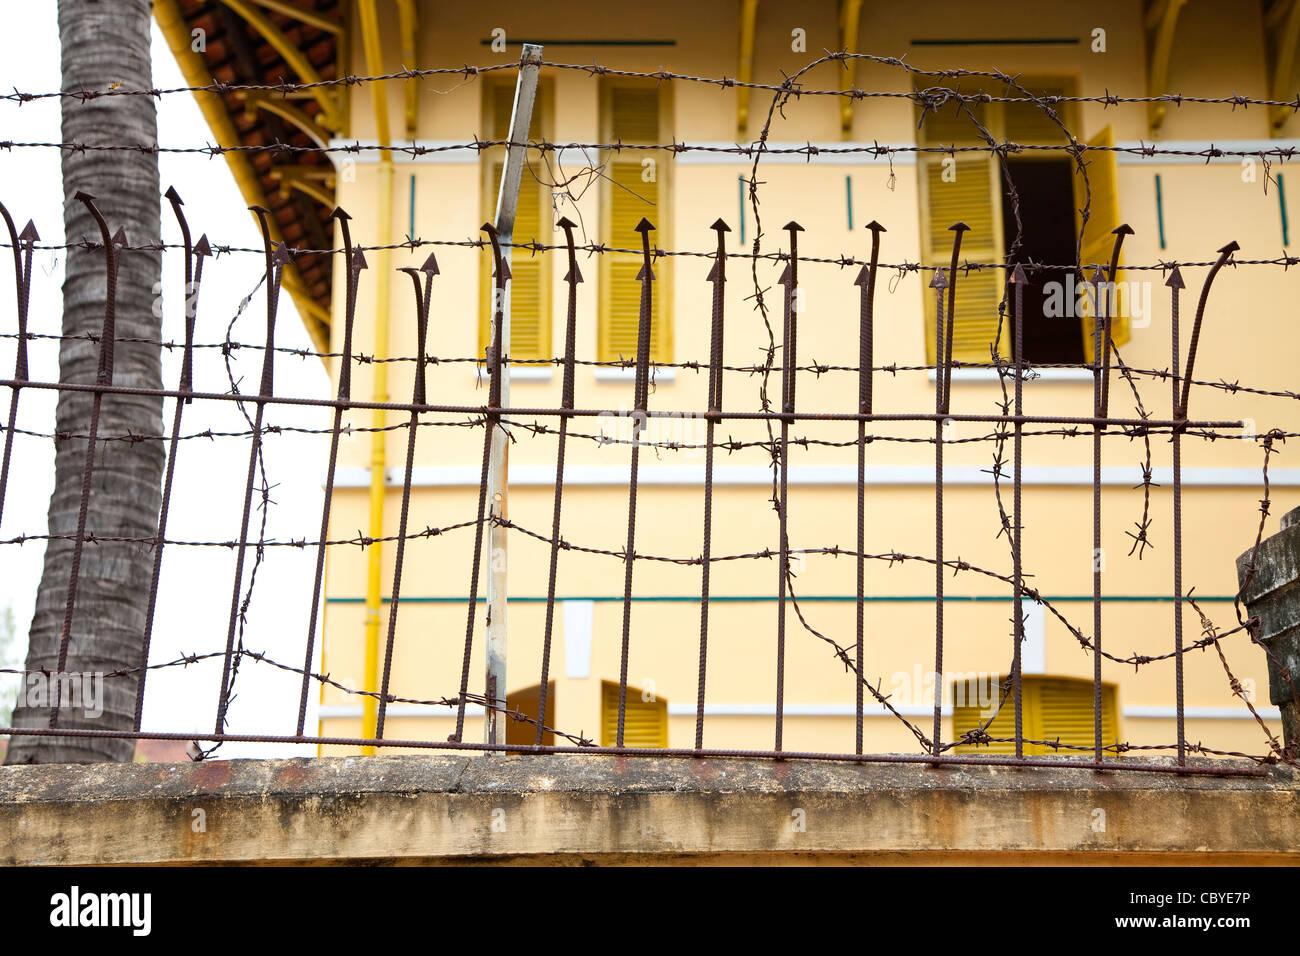 Barbed wire fence, Phnom Penh, Cambodia, Asia - Stock Image